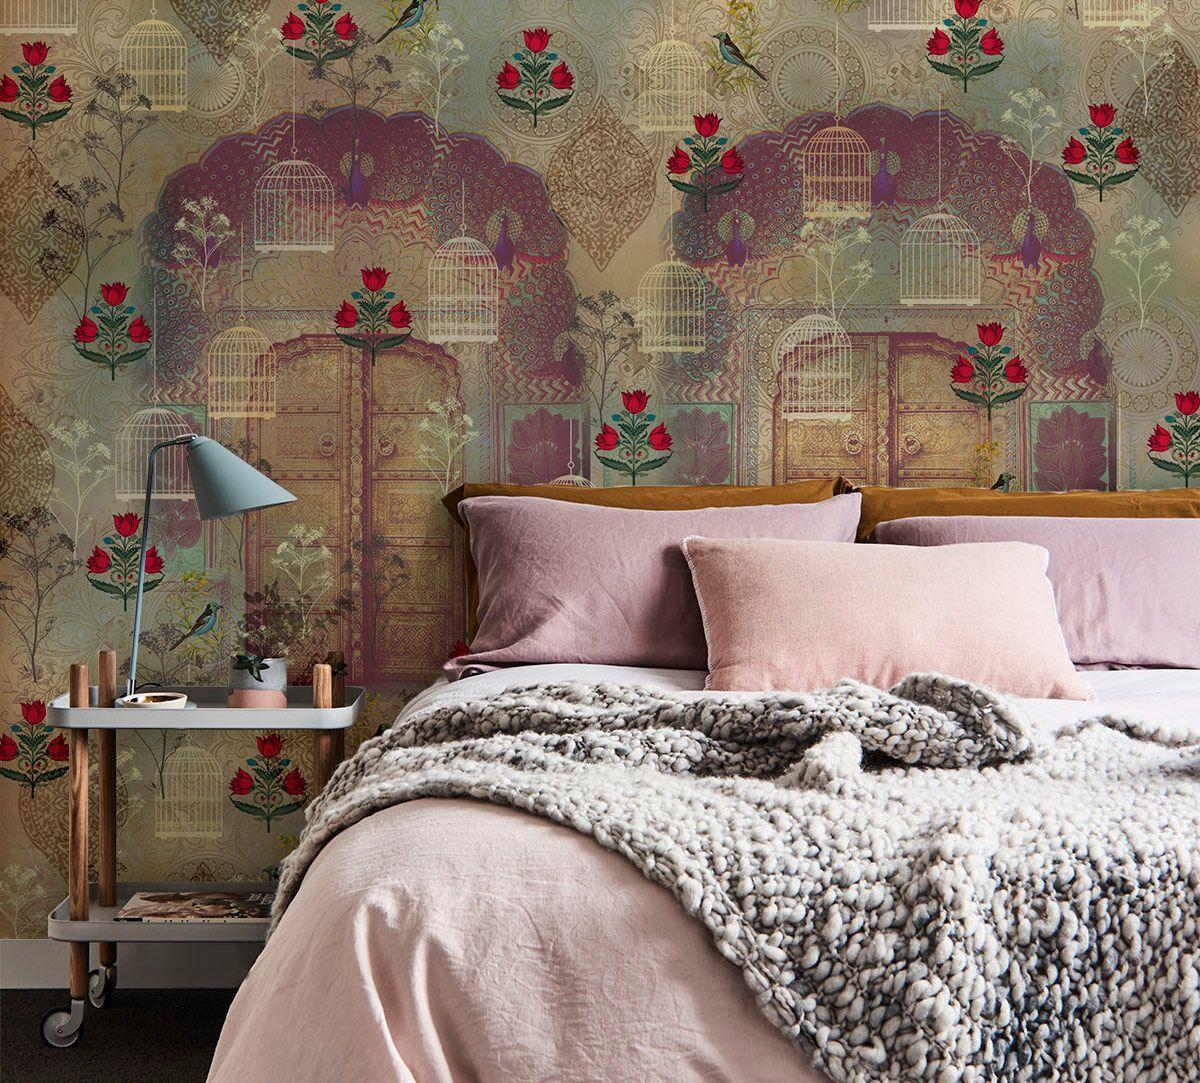 Purgatory of Nirvana - Warm Wallpaper